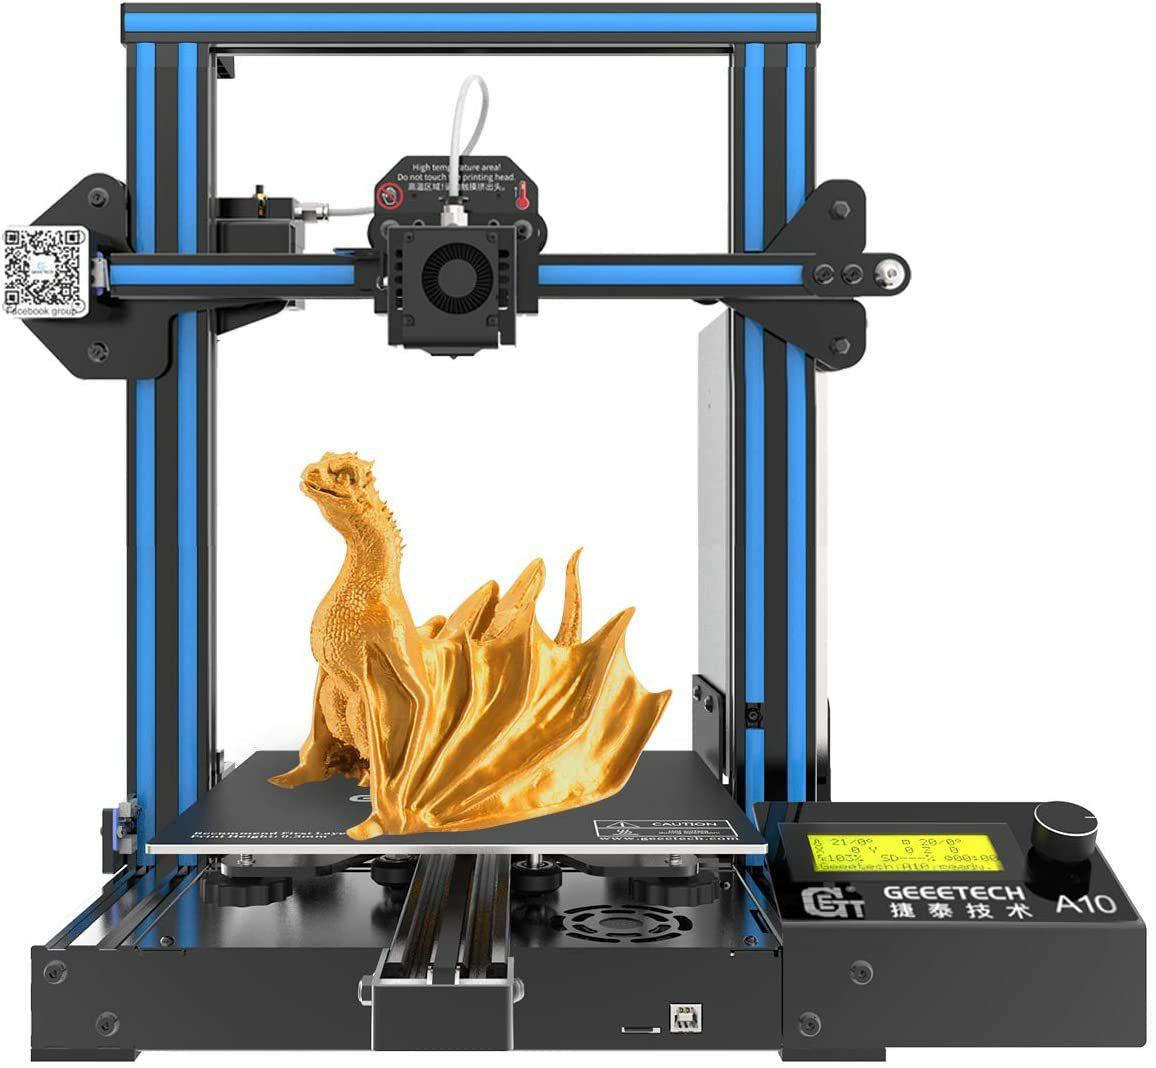 GIANTRAM A10 Impresora 3D Prusa I3